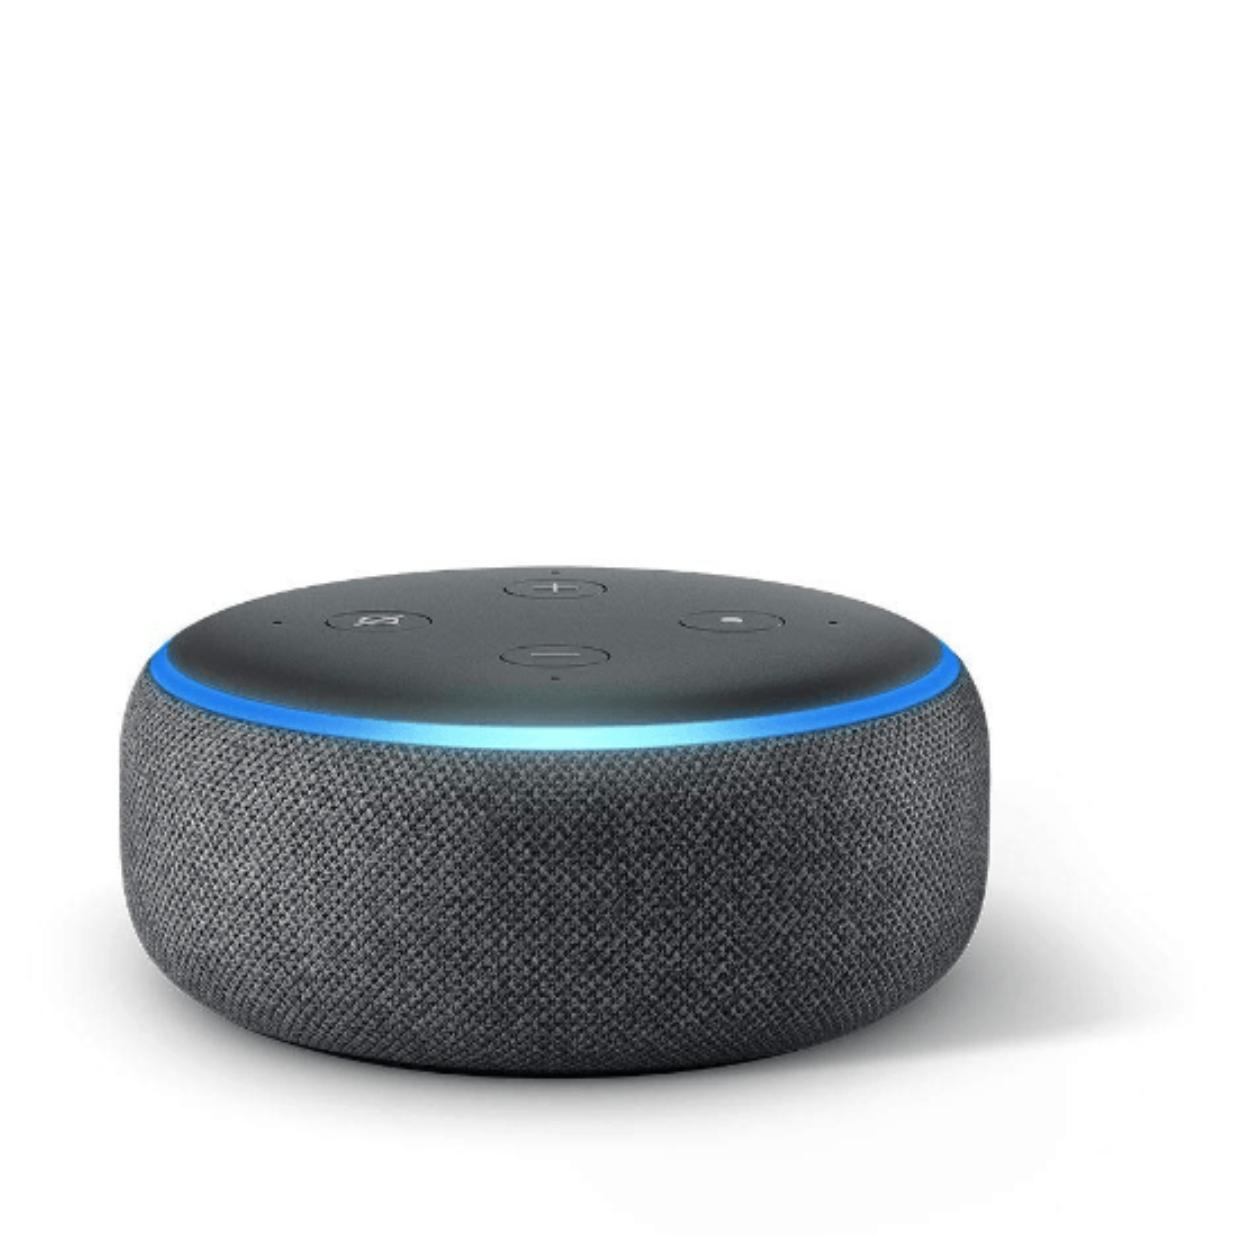 Amazon echo dot 3 generacion 19,00€